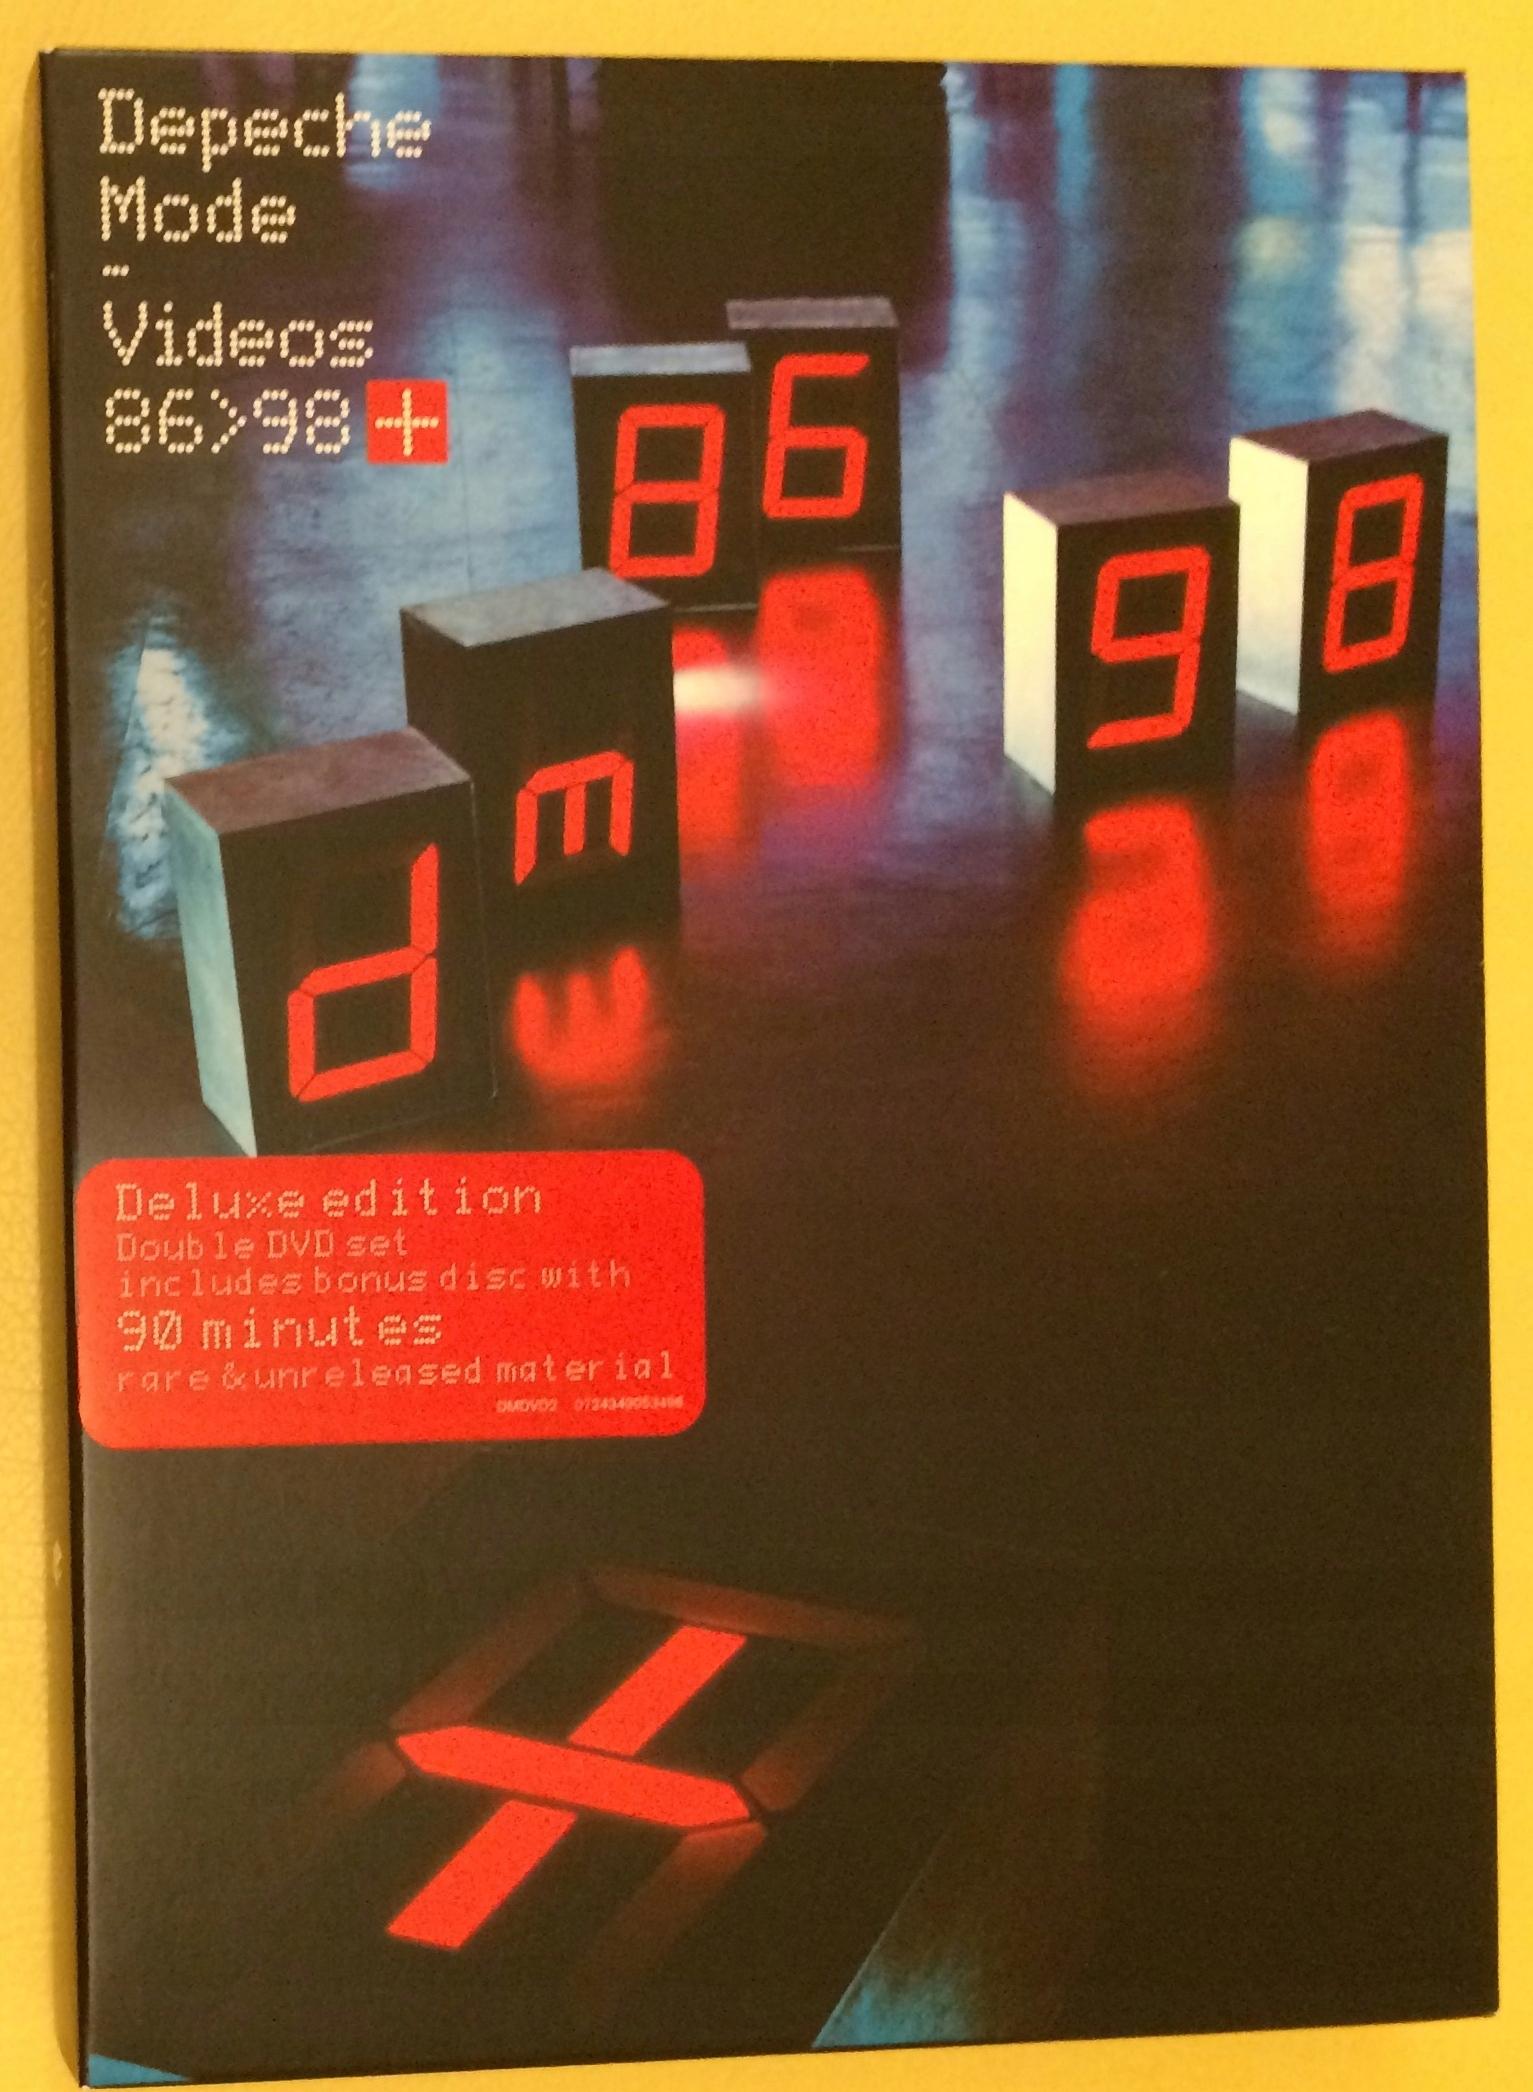 Depeche Mode - Videos 86>98 (Deluxe) [2DVD]